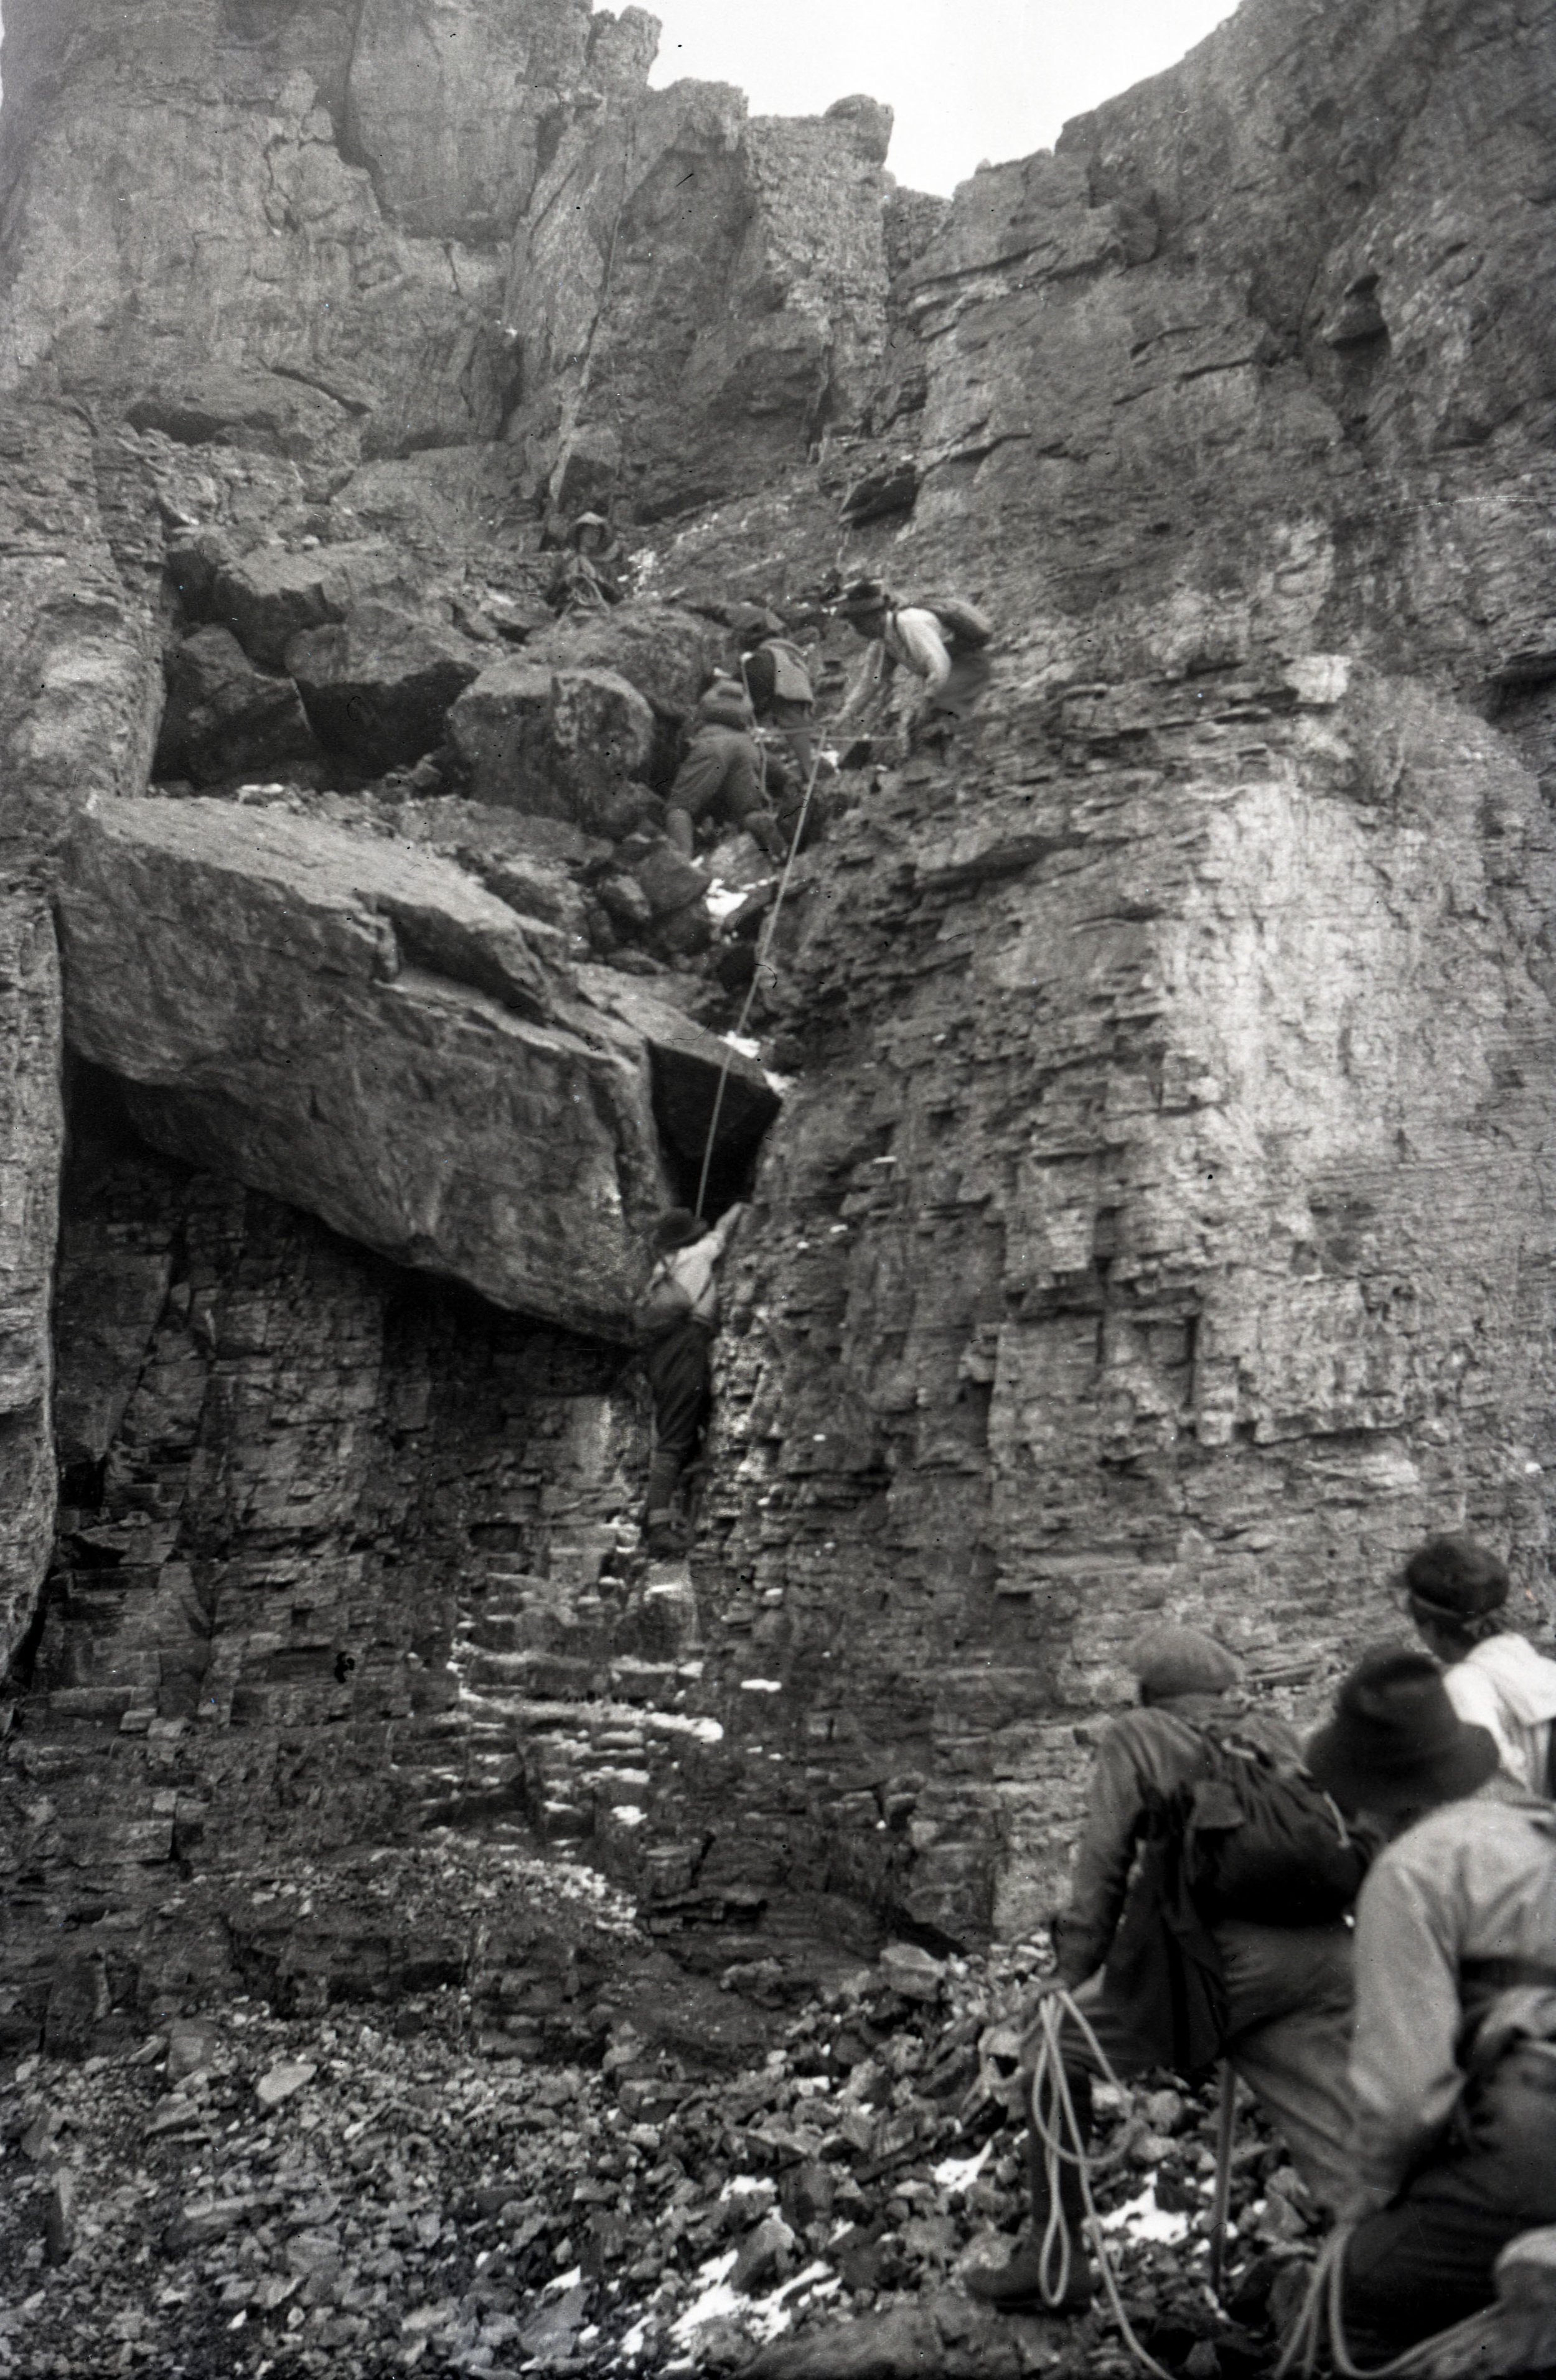 Climbers on Odaray Mountain